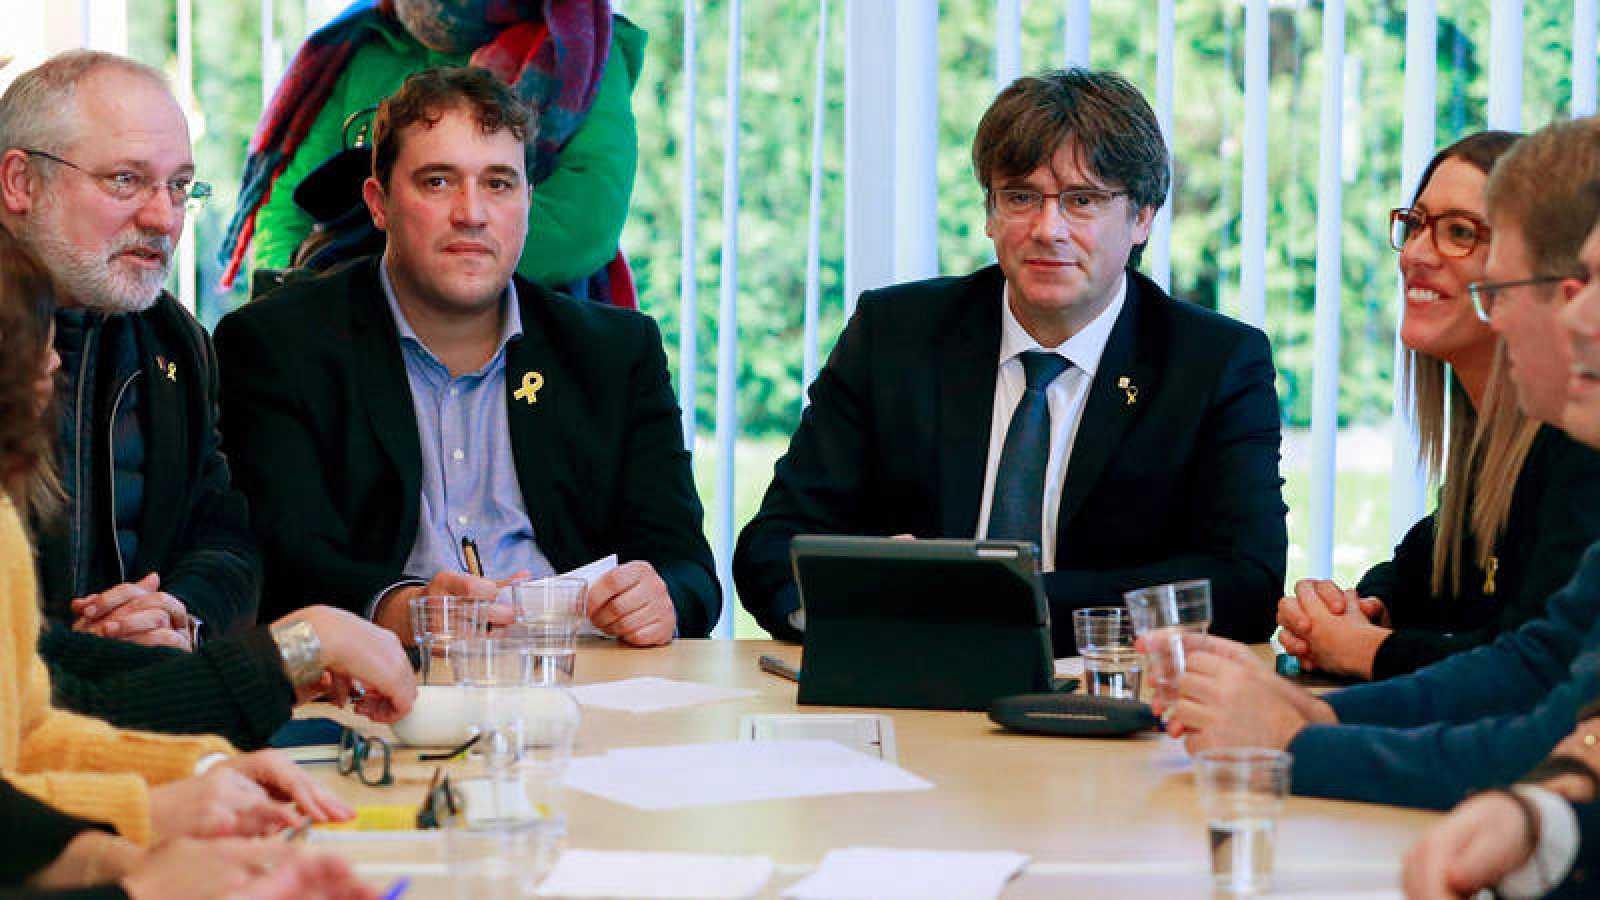 El expresident Puigdemont se reúne con la ejecutiva del PDECat en Waterloo (Bélgica)